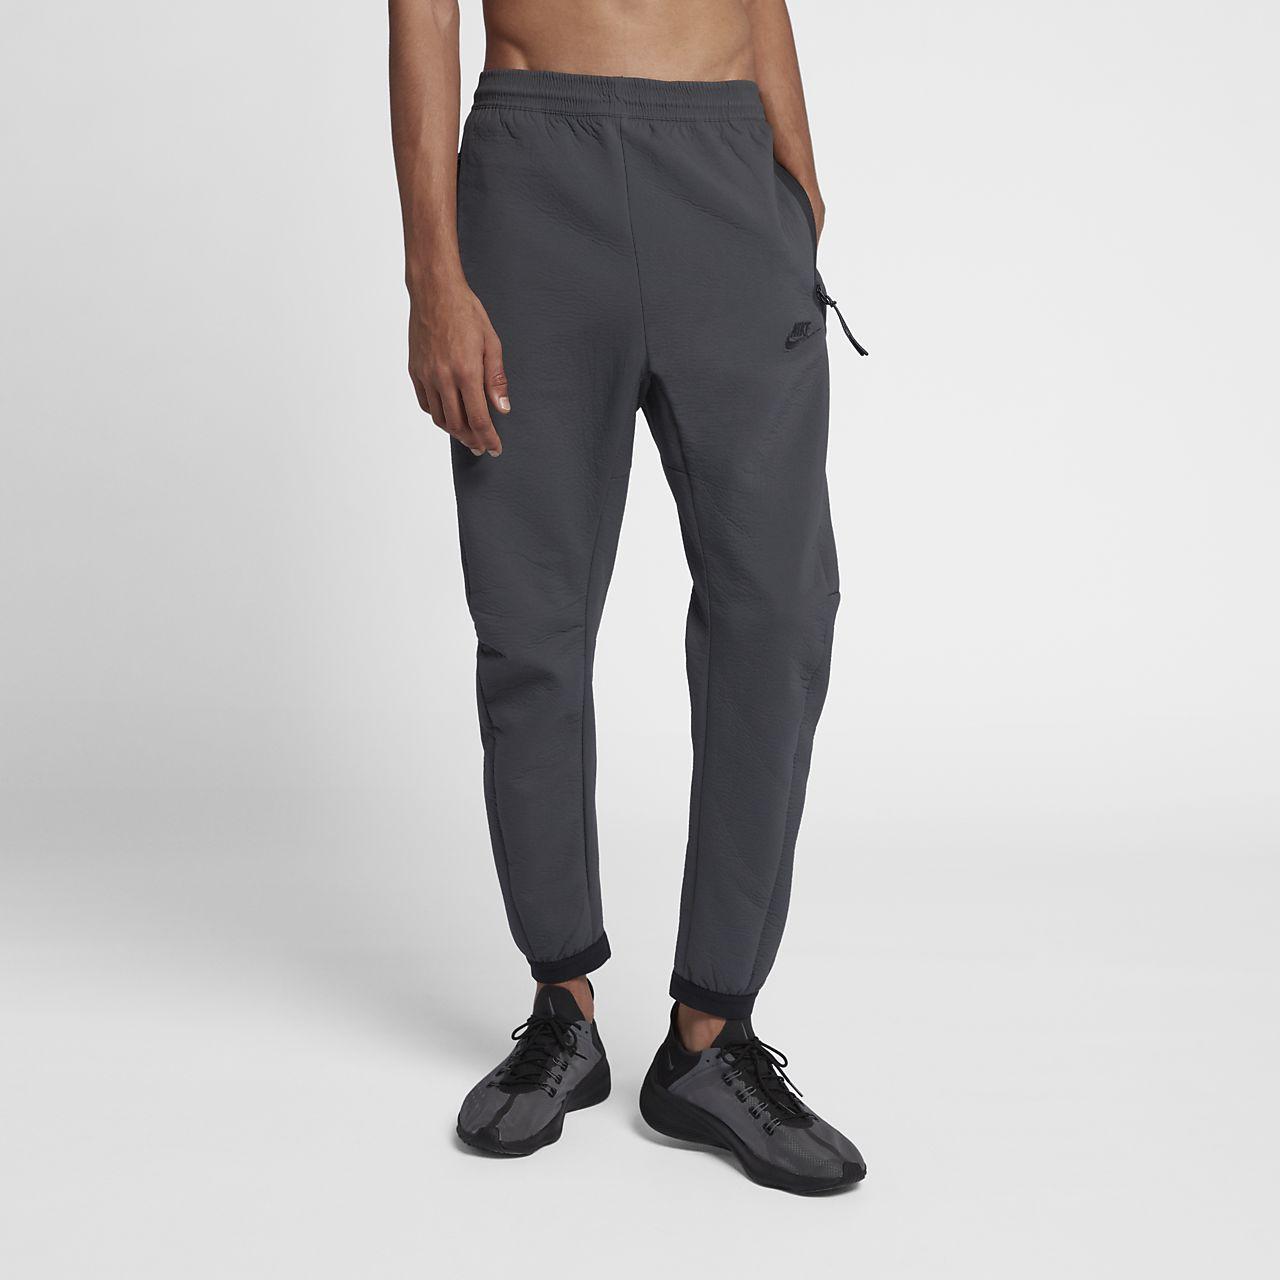 7bfa717d138826 Nike Sportswear Tech Pack Web-Track-Pants. Nike.com DE